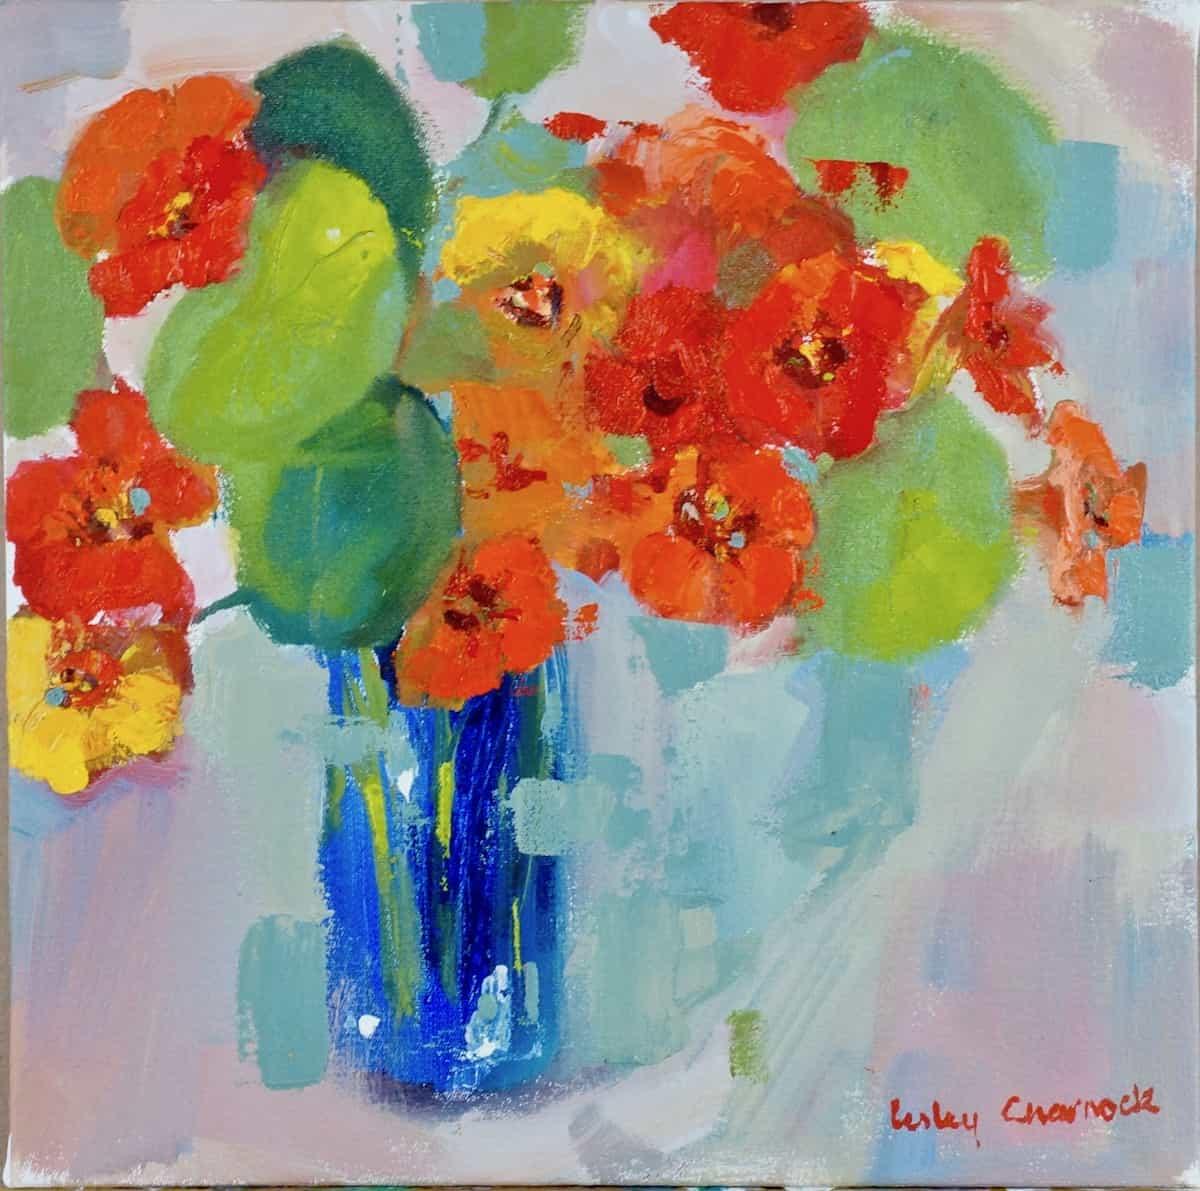 Lesley Charnock